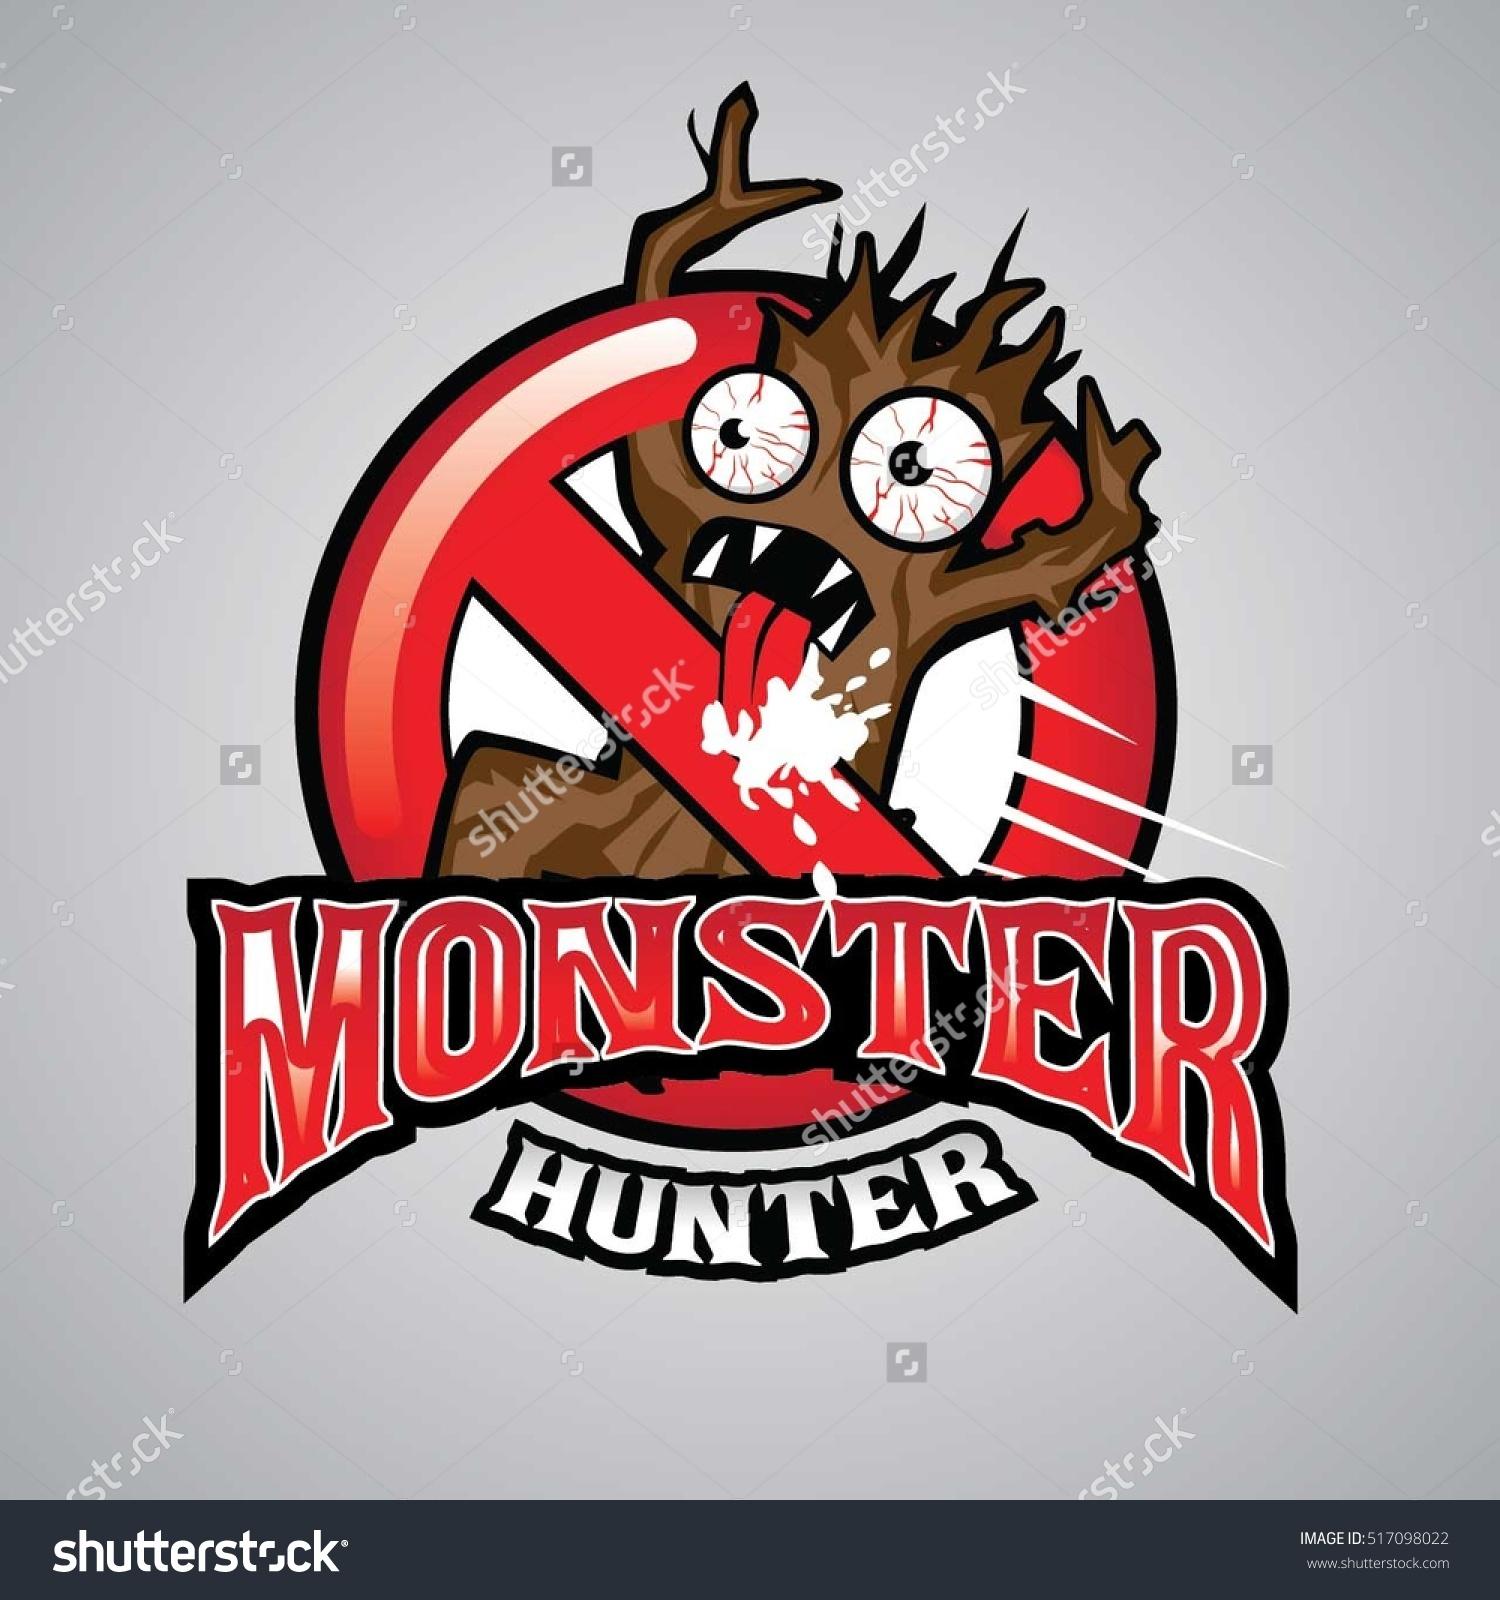 Monsterhunter clipart #14, Download drawings